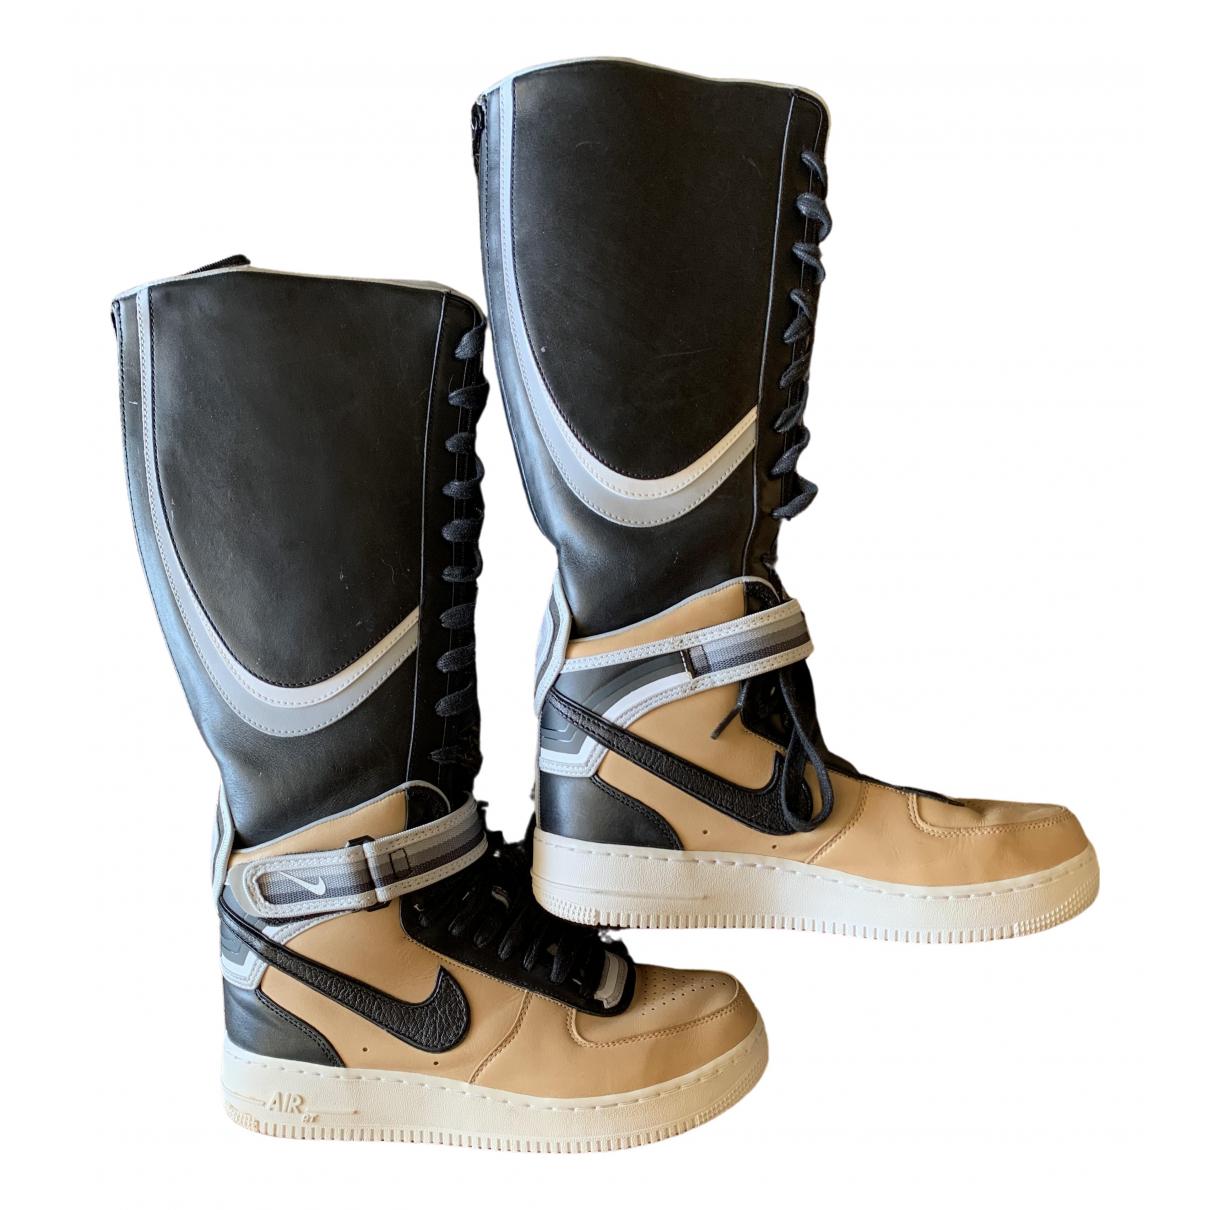 Nike By Riccardo Tisci \N Beige Leather Trainers for Women 40 EU